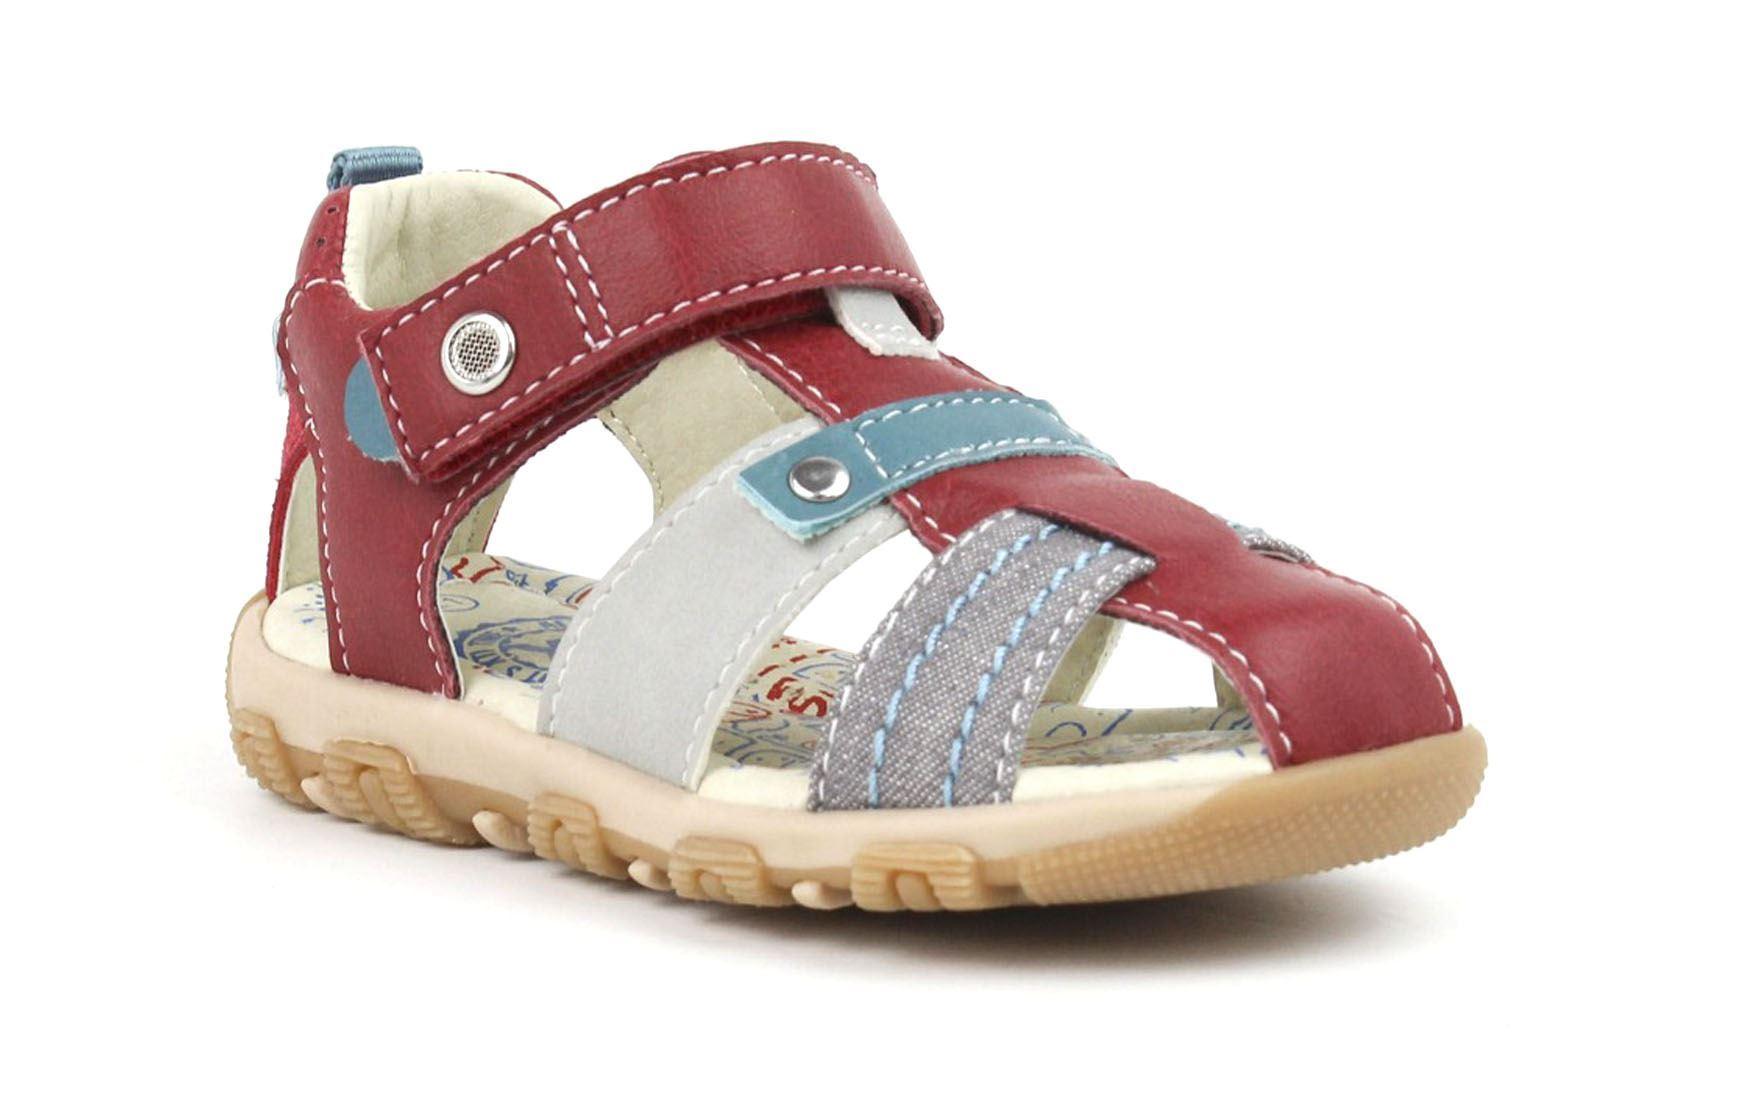 Boys Xti Kids Fishermans Sandal Red//Grey Hook /& Loop Child Size Eu 24-30 UK 7-11